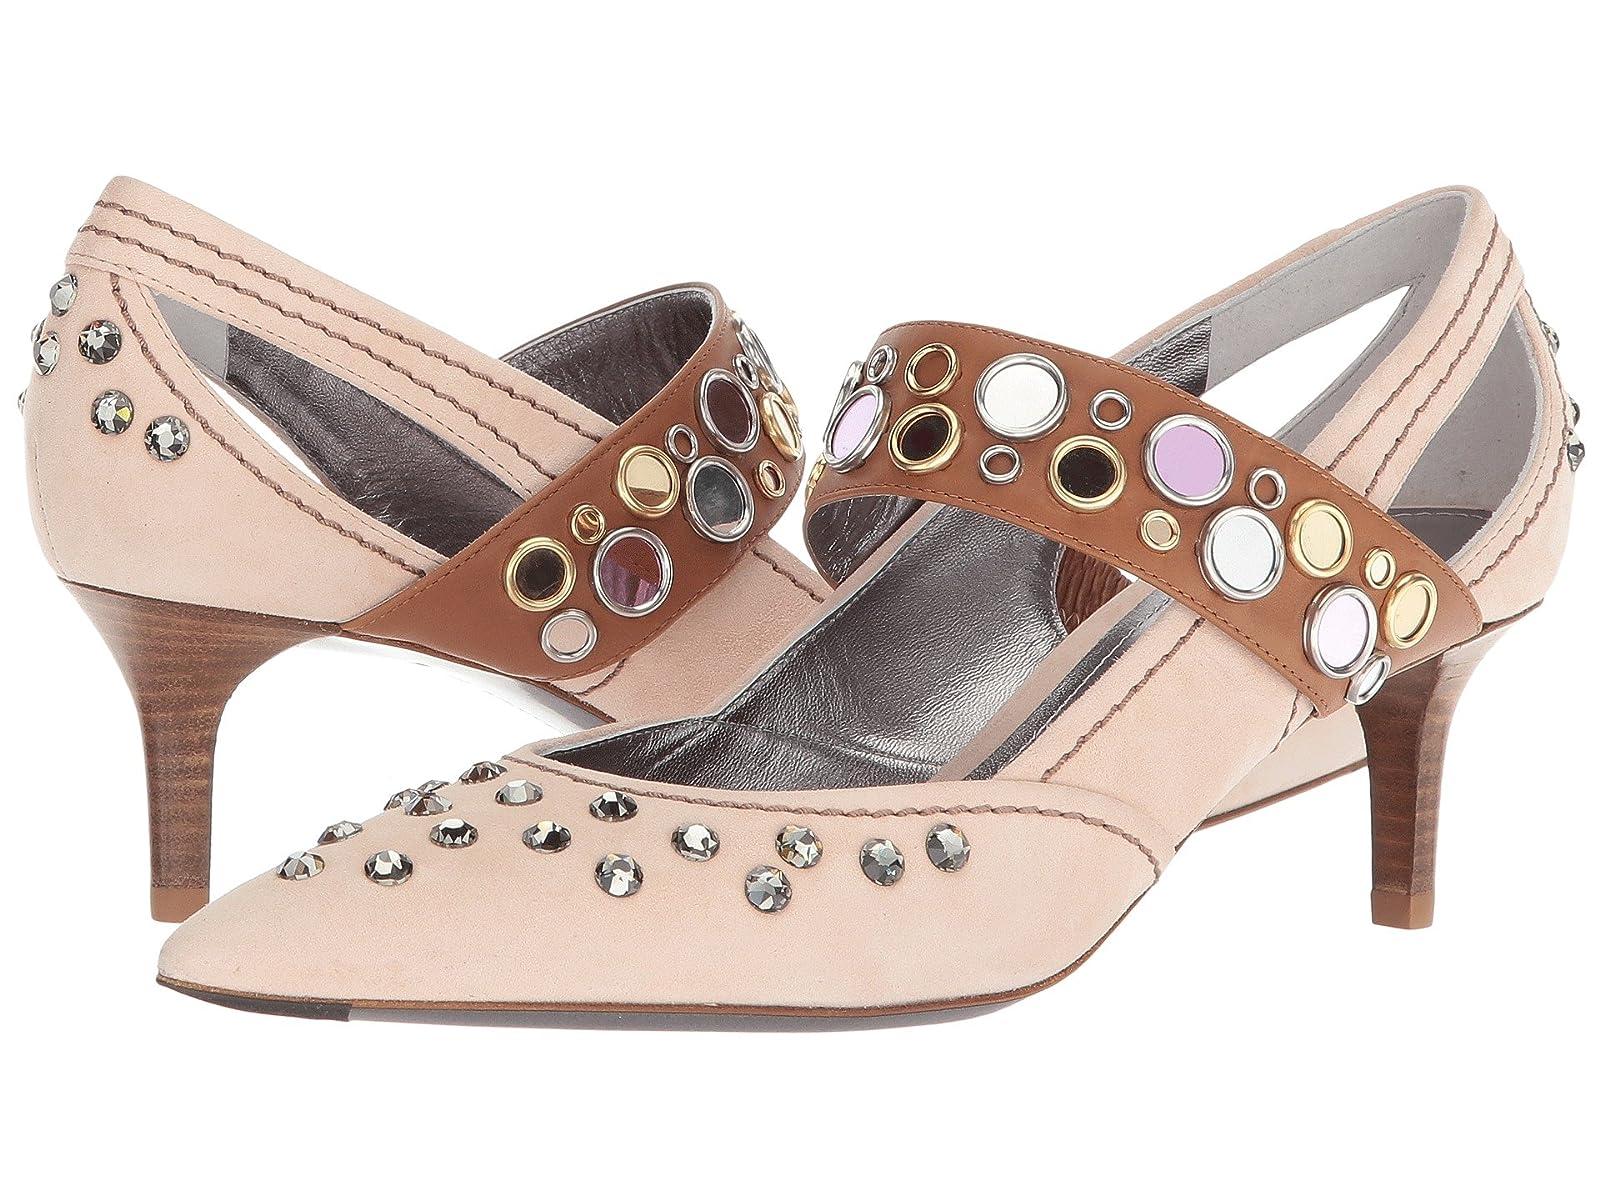 Bottega Veneta Buckle Dorsey 5.5cm PumpAtmospheric grades have affordable shoes